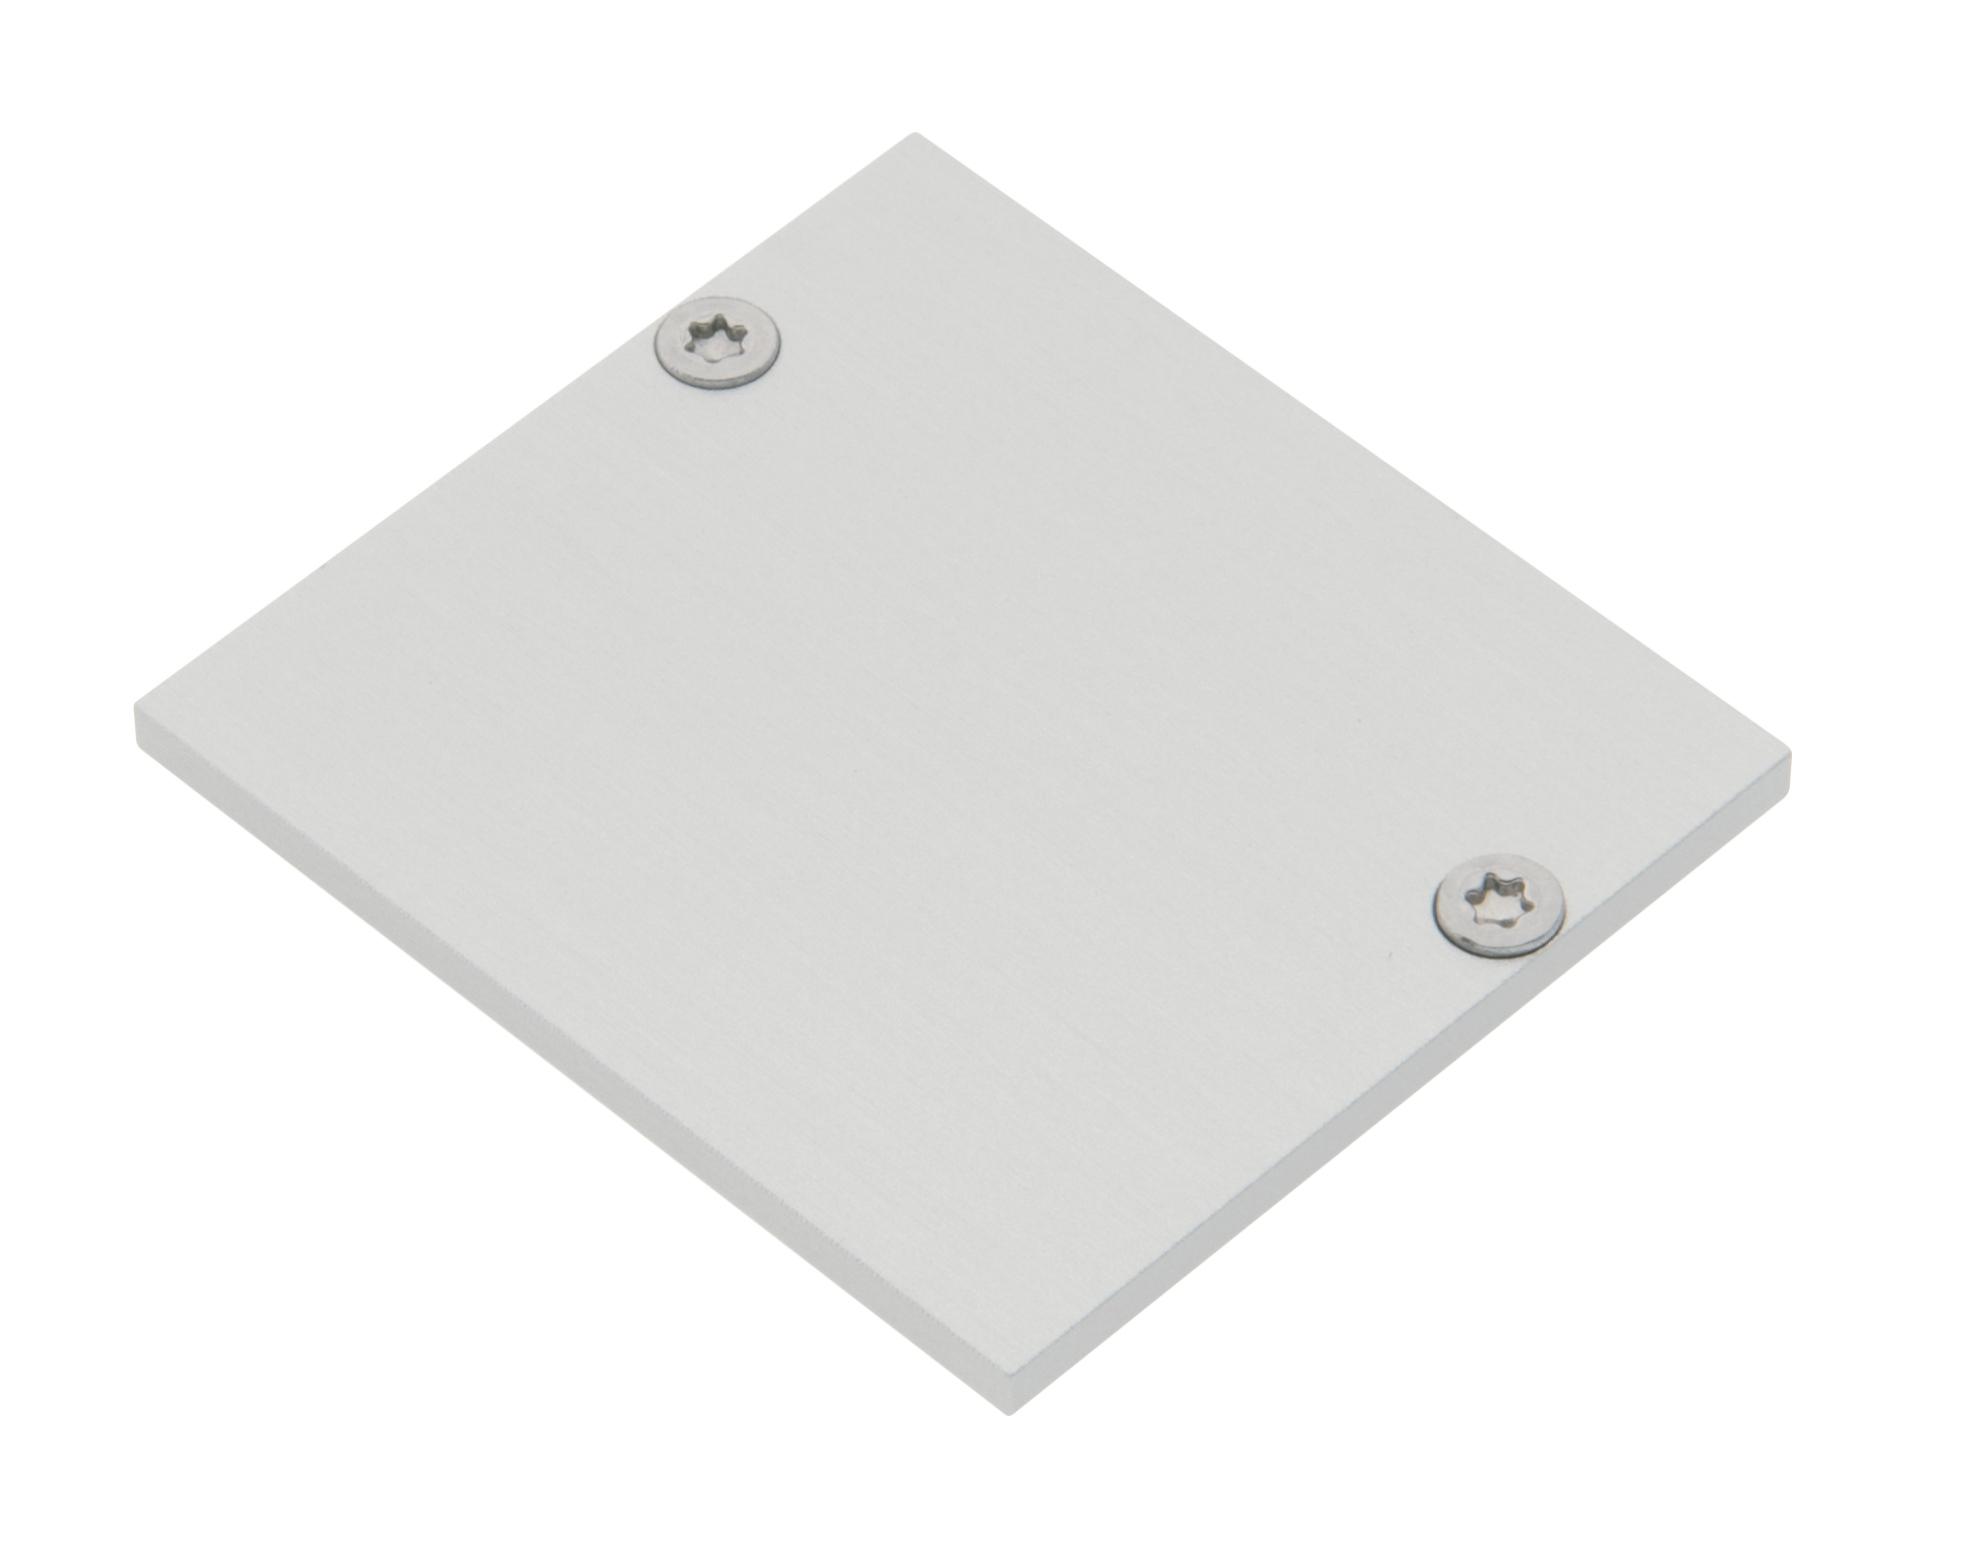 1 Stk Profil Endkappe MFS + MFL Flach geschlossen inkl. Schrauben LIEK005605